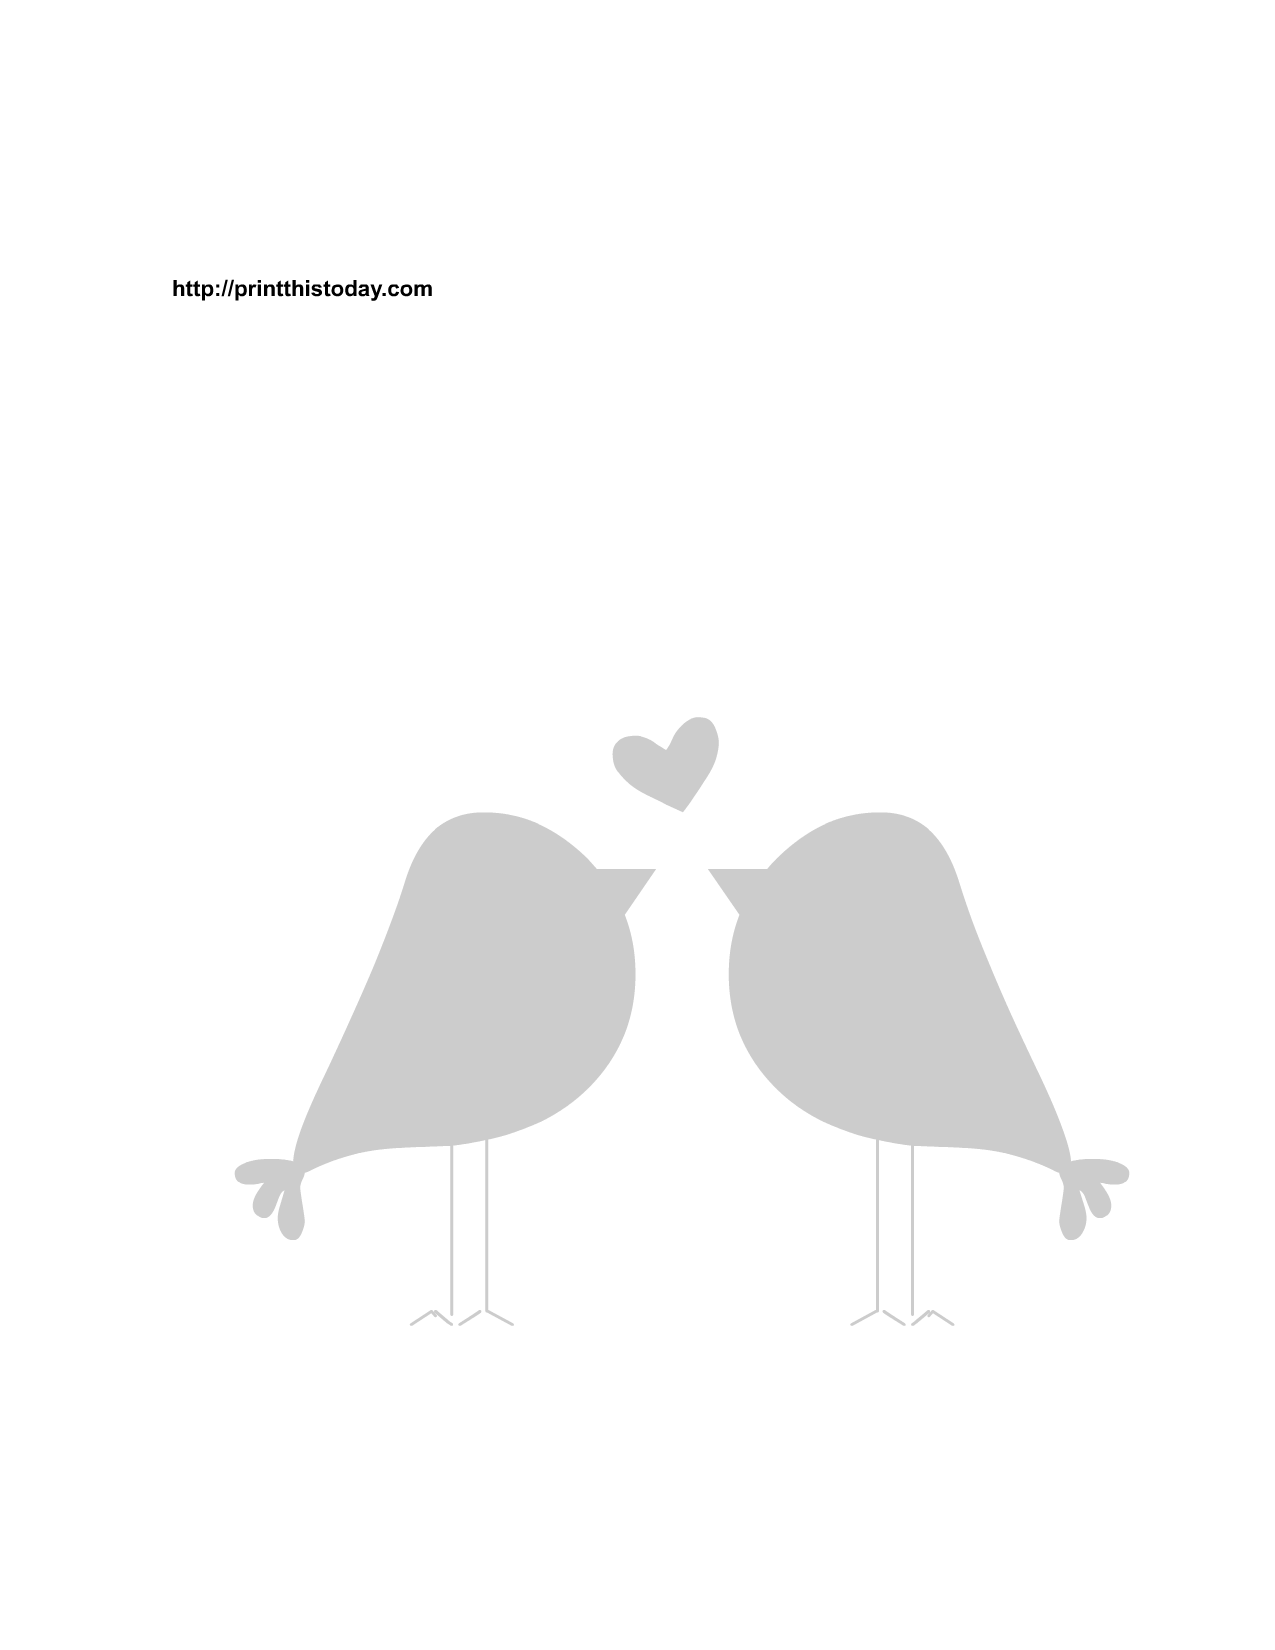 Free Printable Love Birds Stencils-Free Printable Love Birds Stencils-5